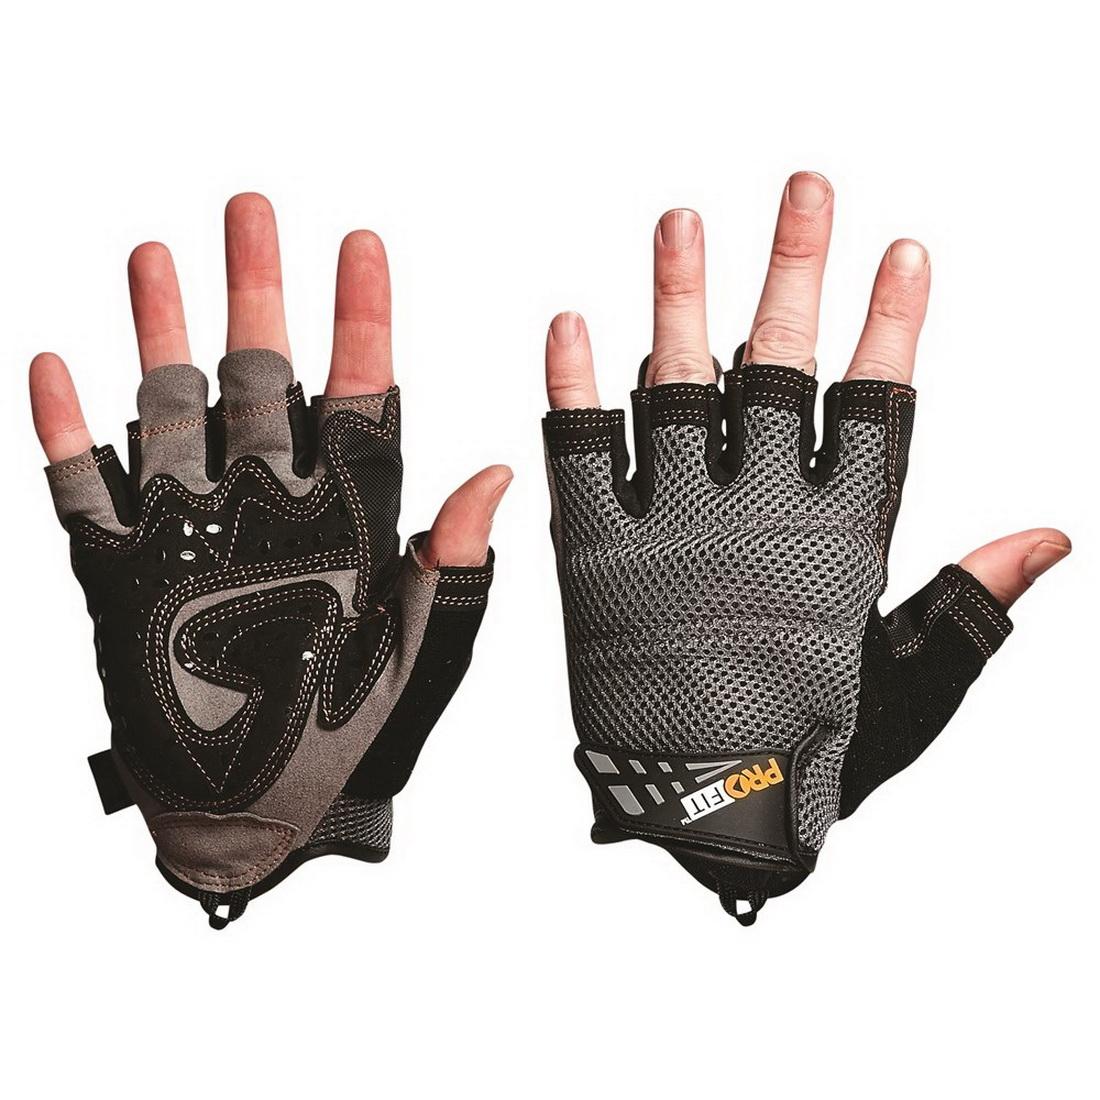 Profit Mechanics Range Fingerless Glove XL Grey/Black